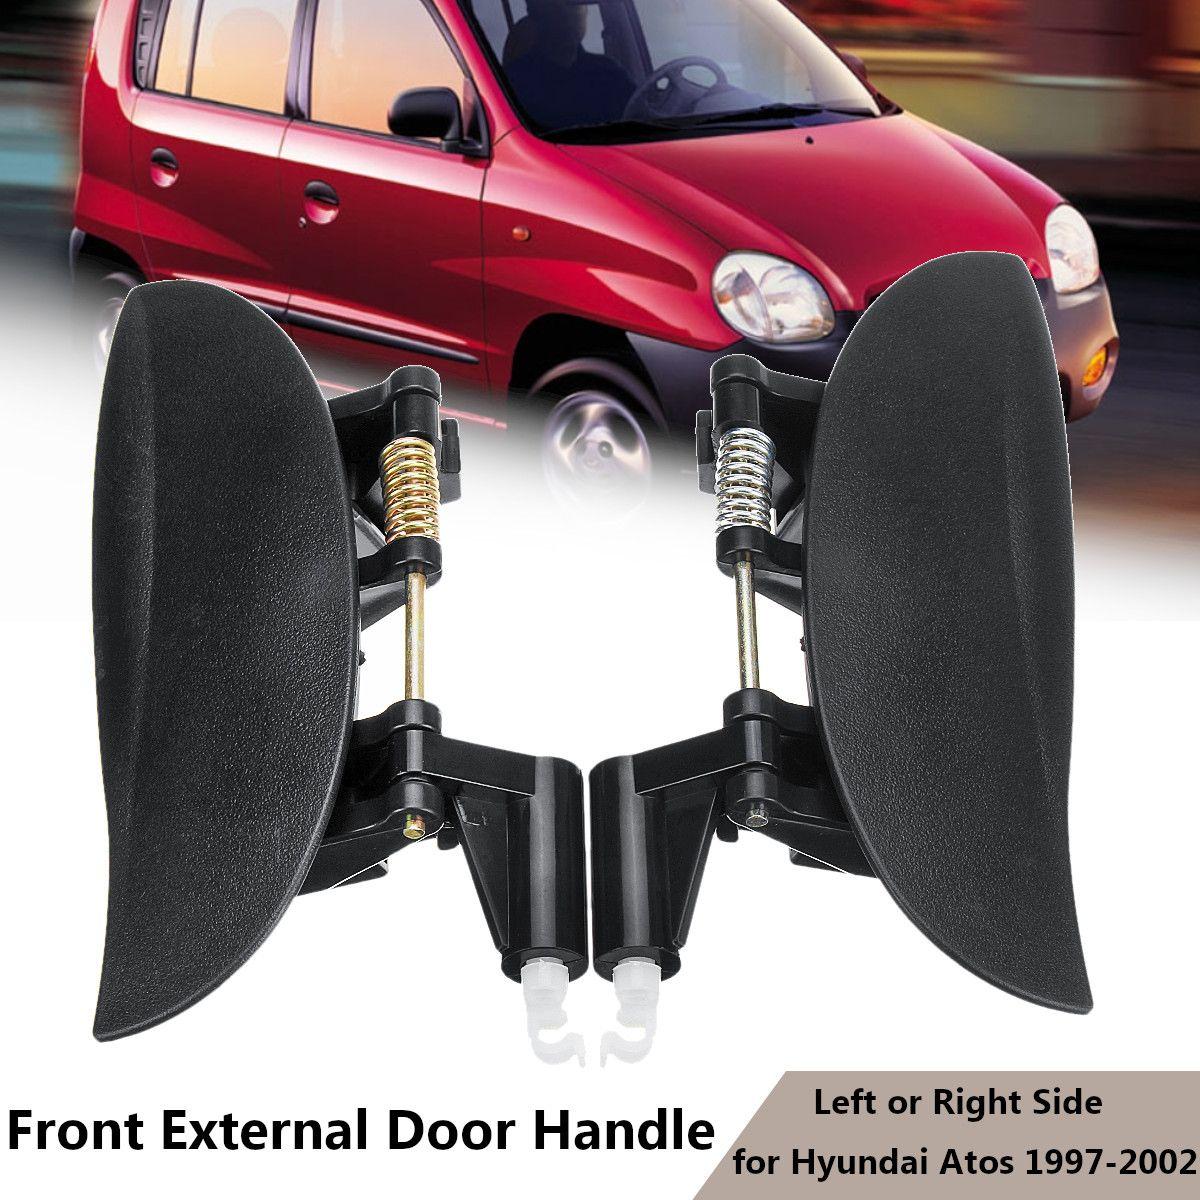 Brake Hydraulic Hose Front Right Autopart Intl fits 01-06 Hyundai Elantra